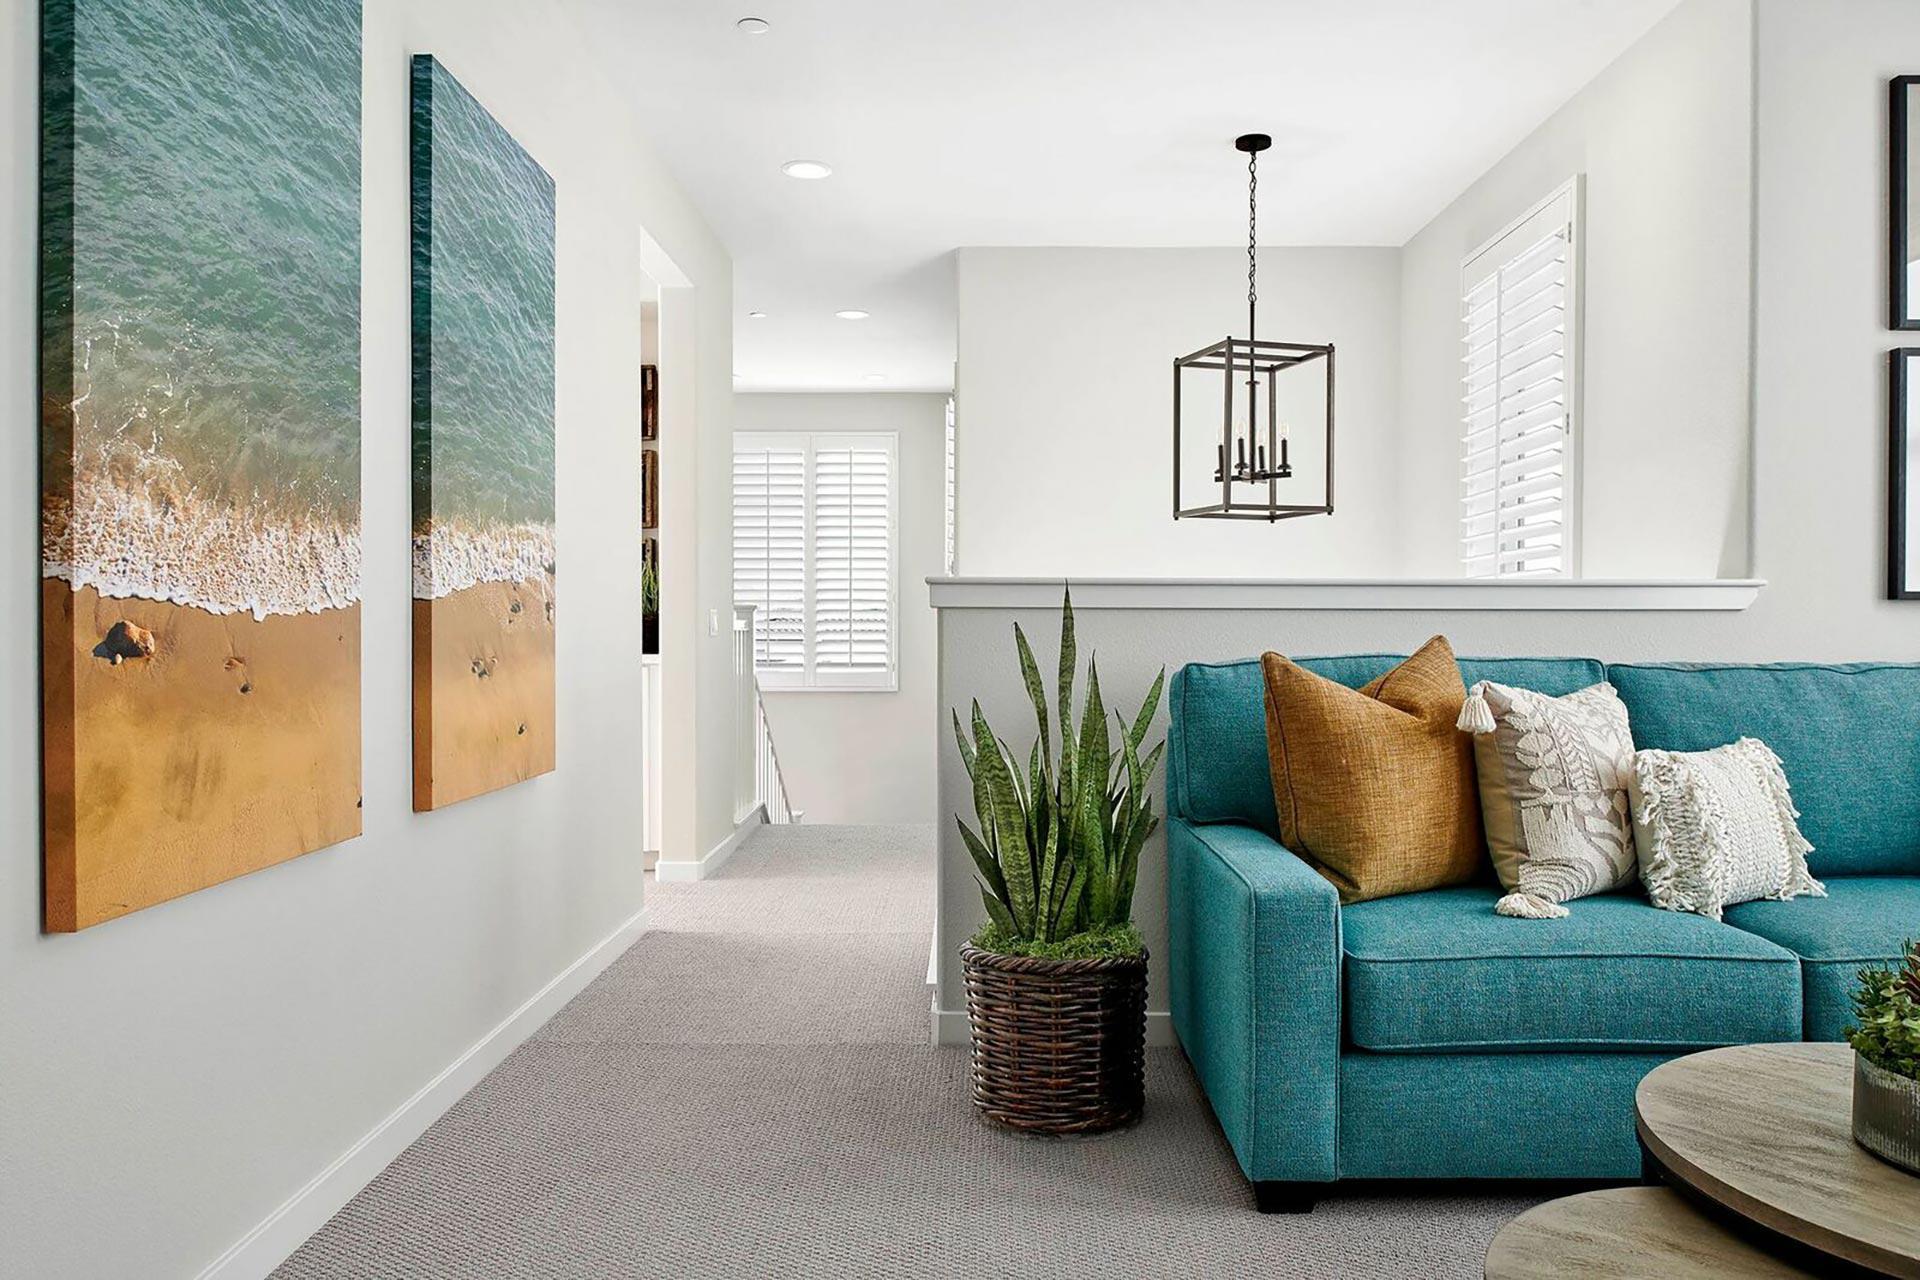 Living room at mystral at Skyline in Santa Clarita